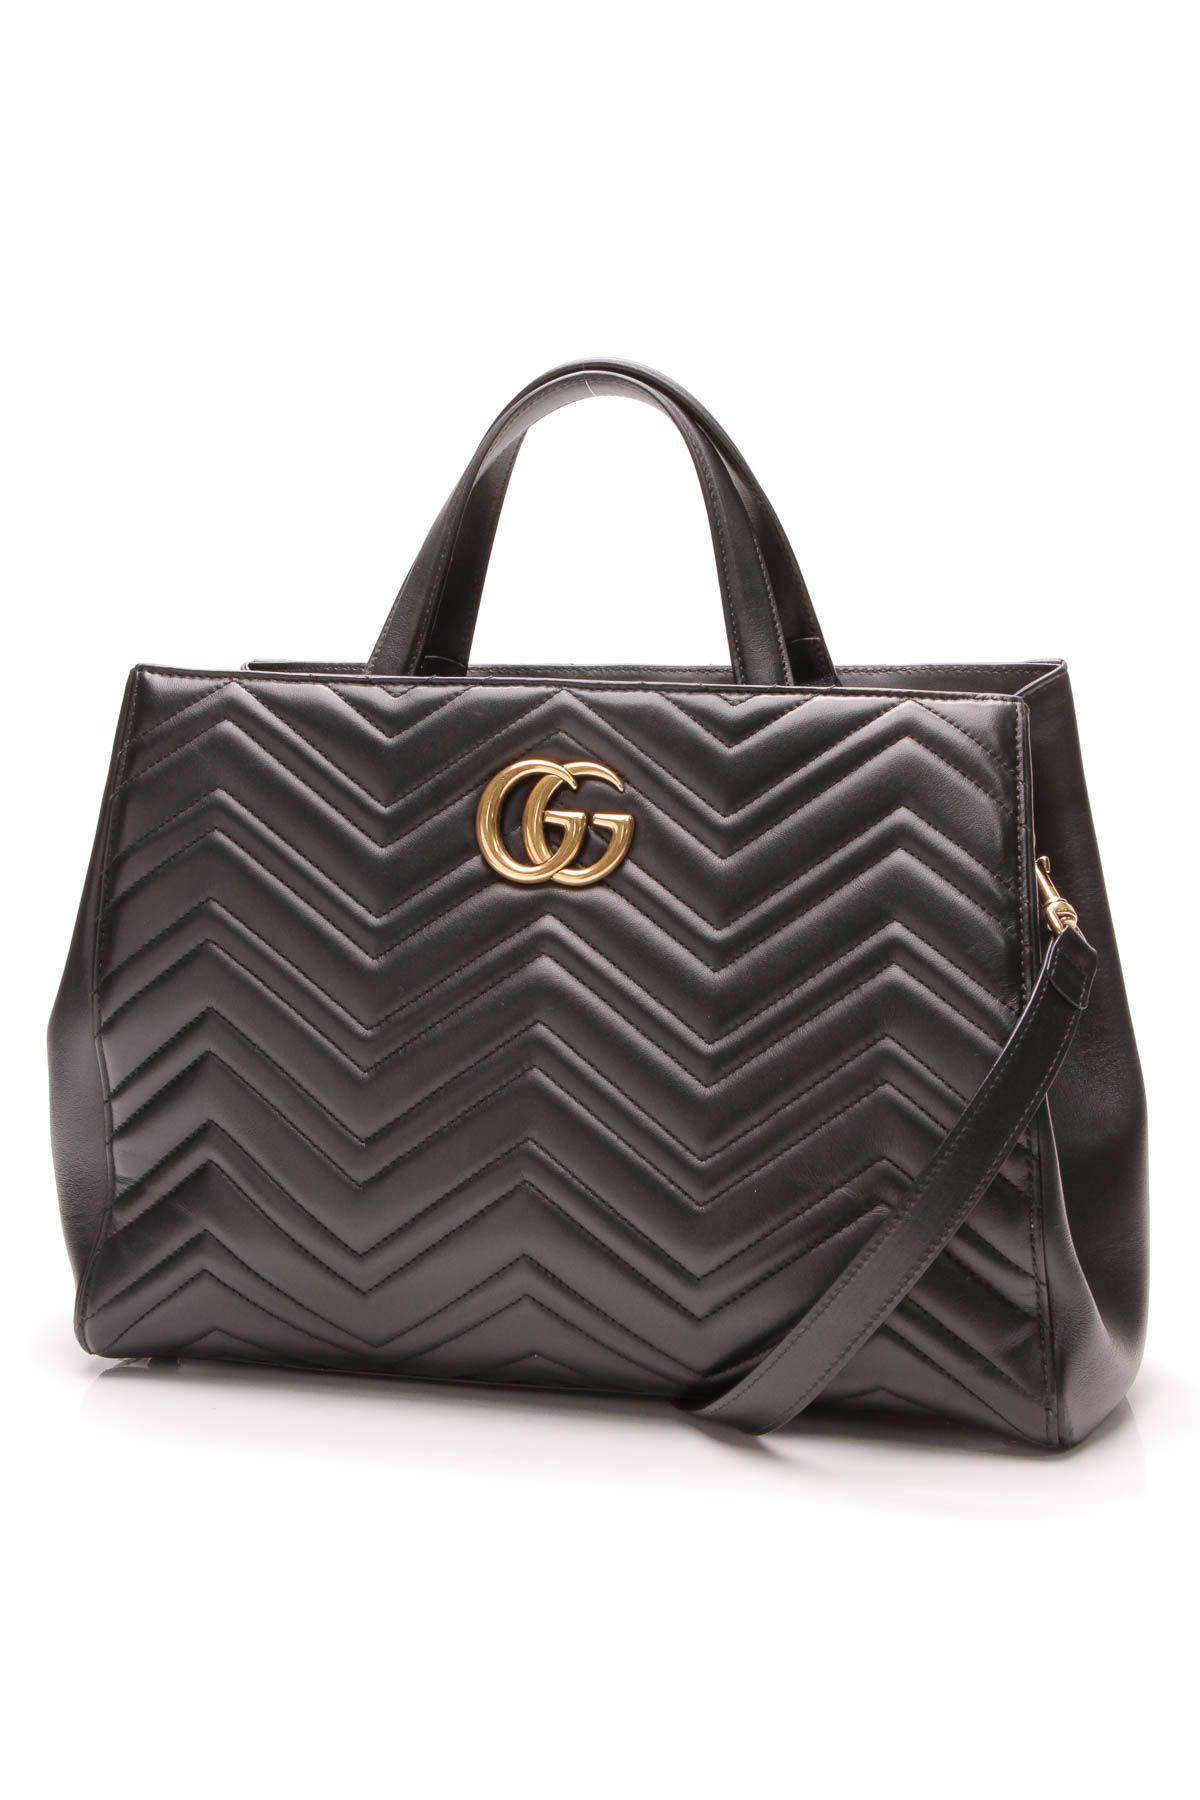 754d81f970b9 Medium Marmont Matelasse Top Handle Bag - Leather in 2019   Gucci ...